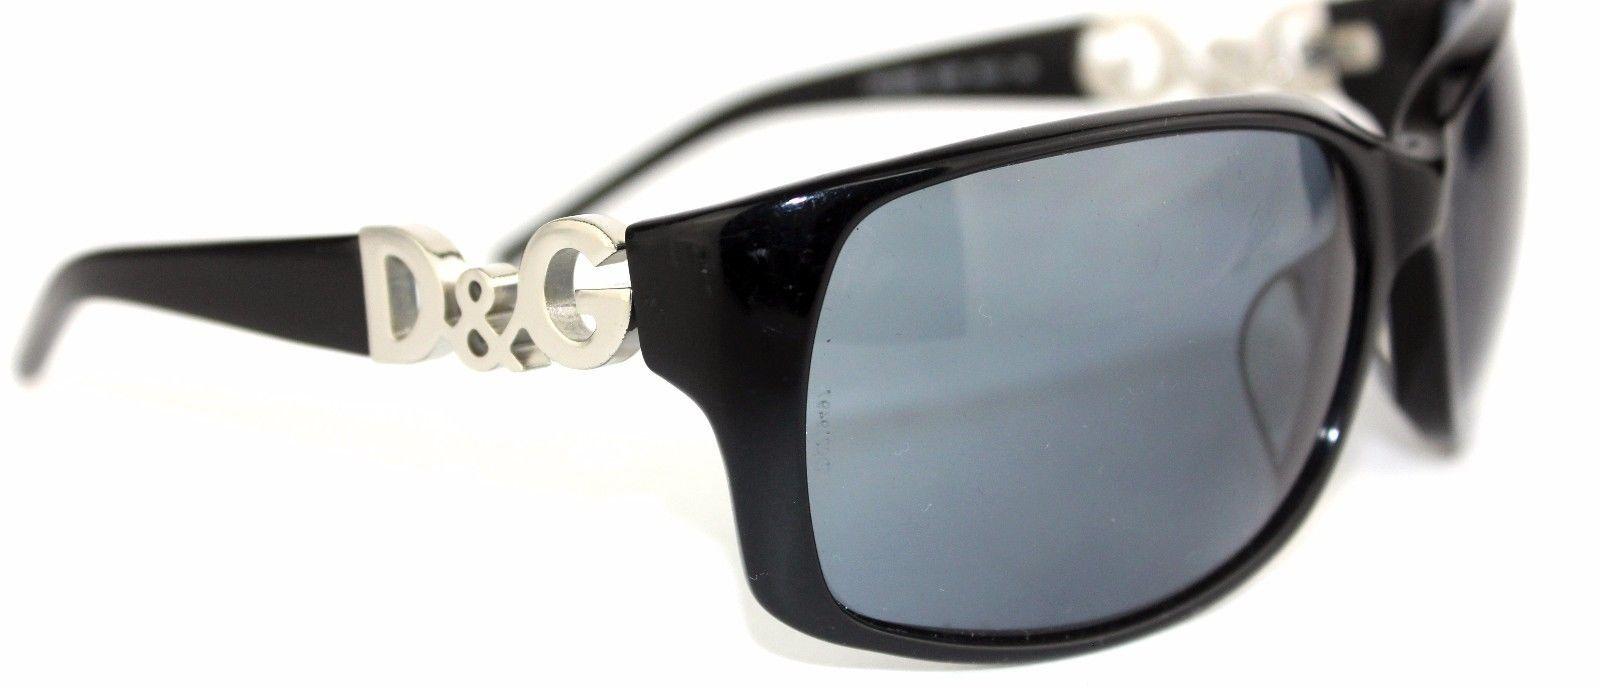 e58aa583cd Authentic Dolce   Gabbana Logos Sunglass Eye and 29 similar items